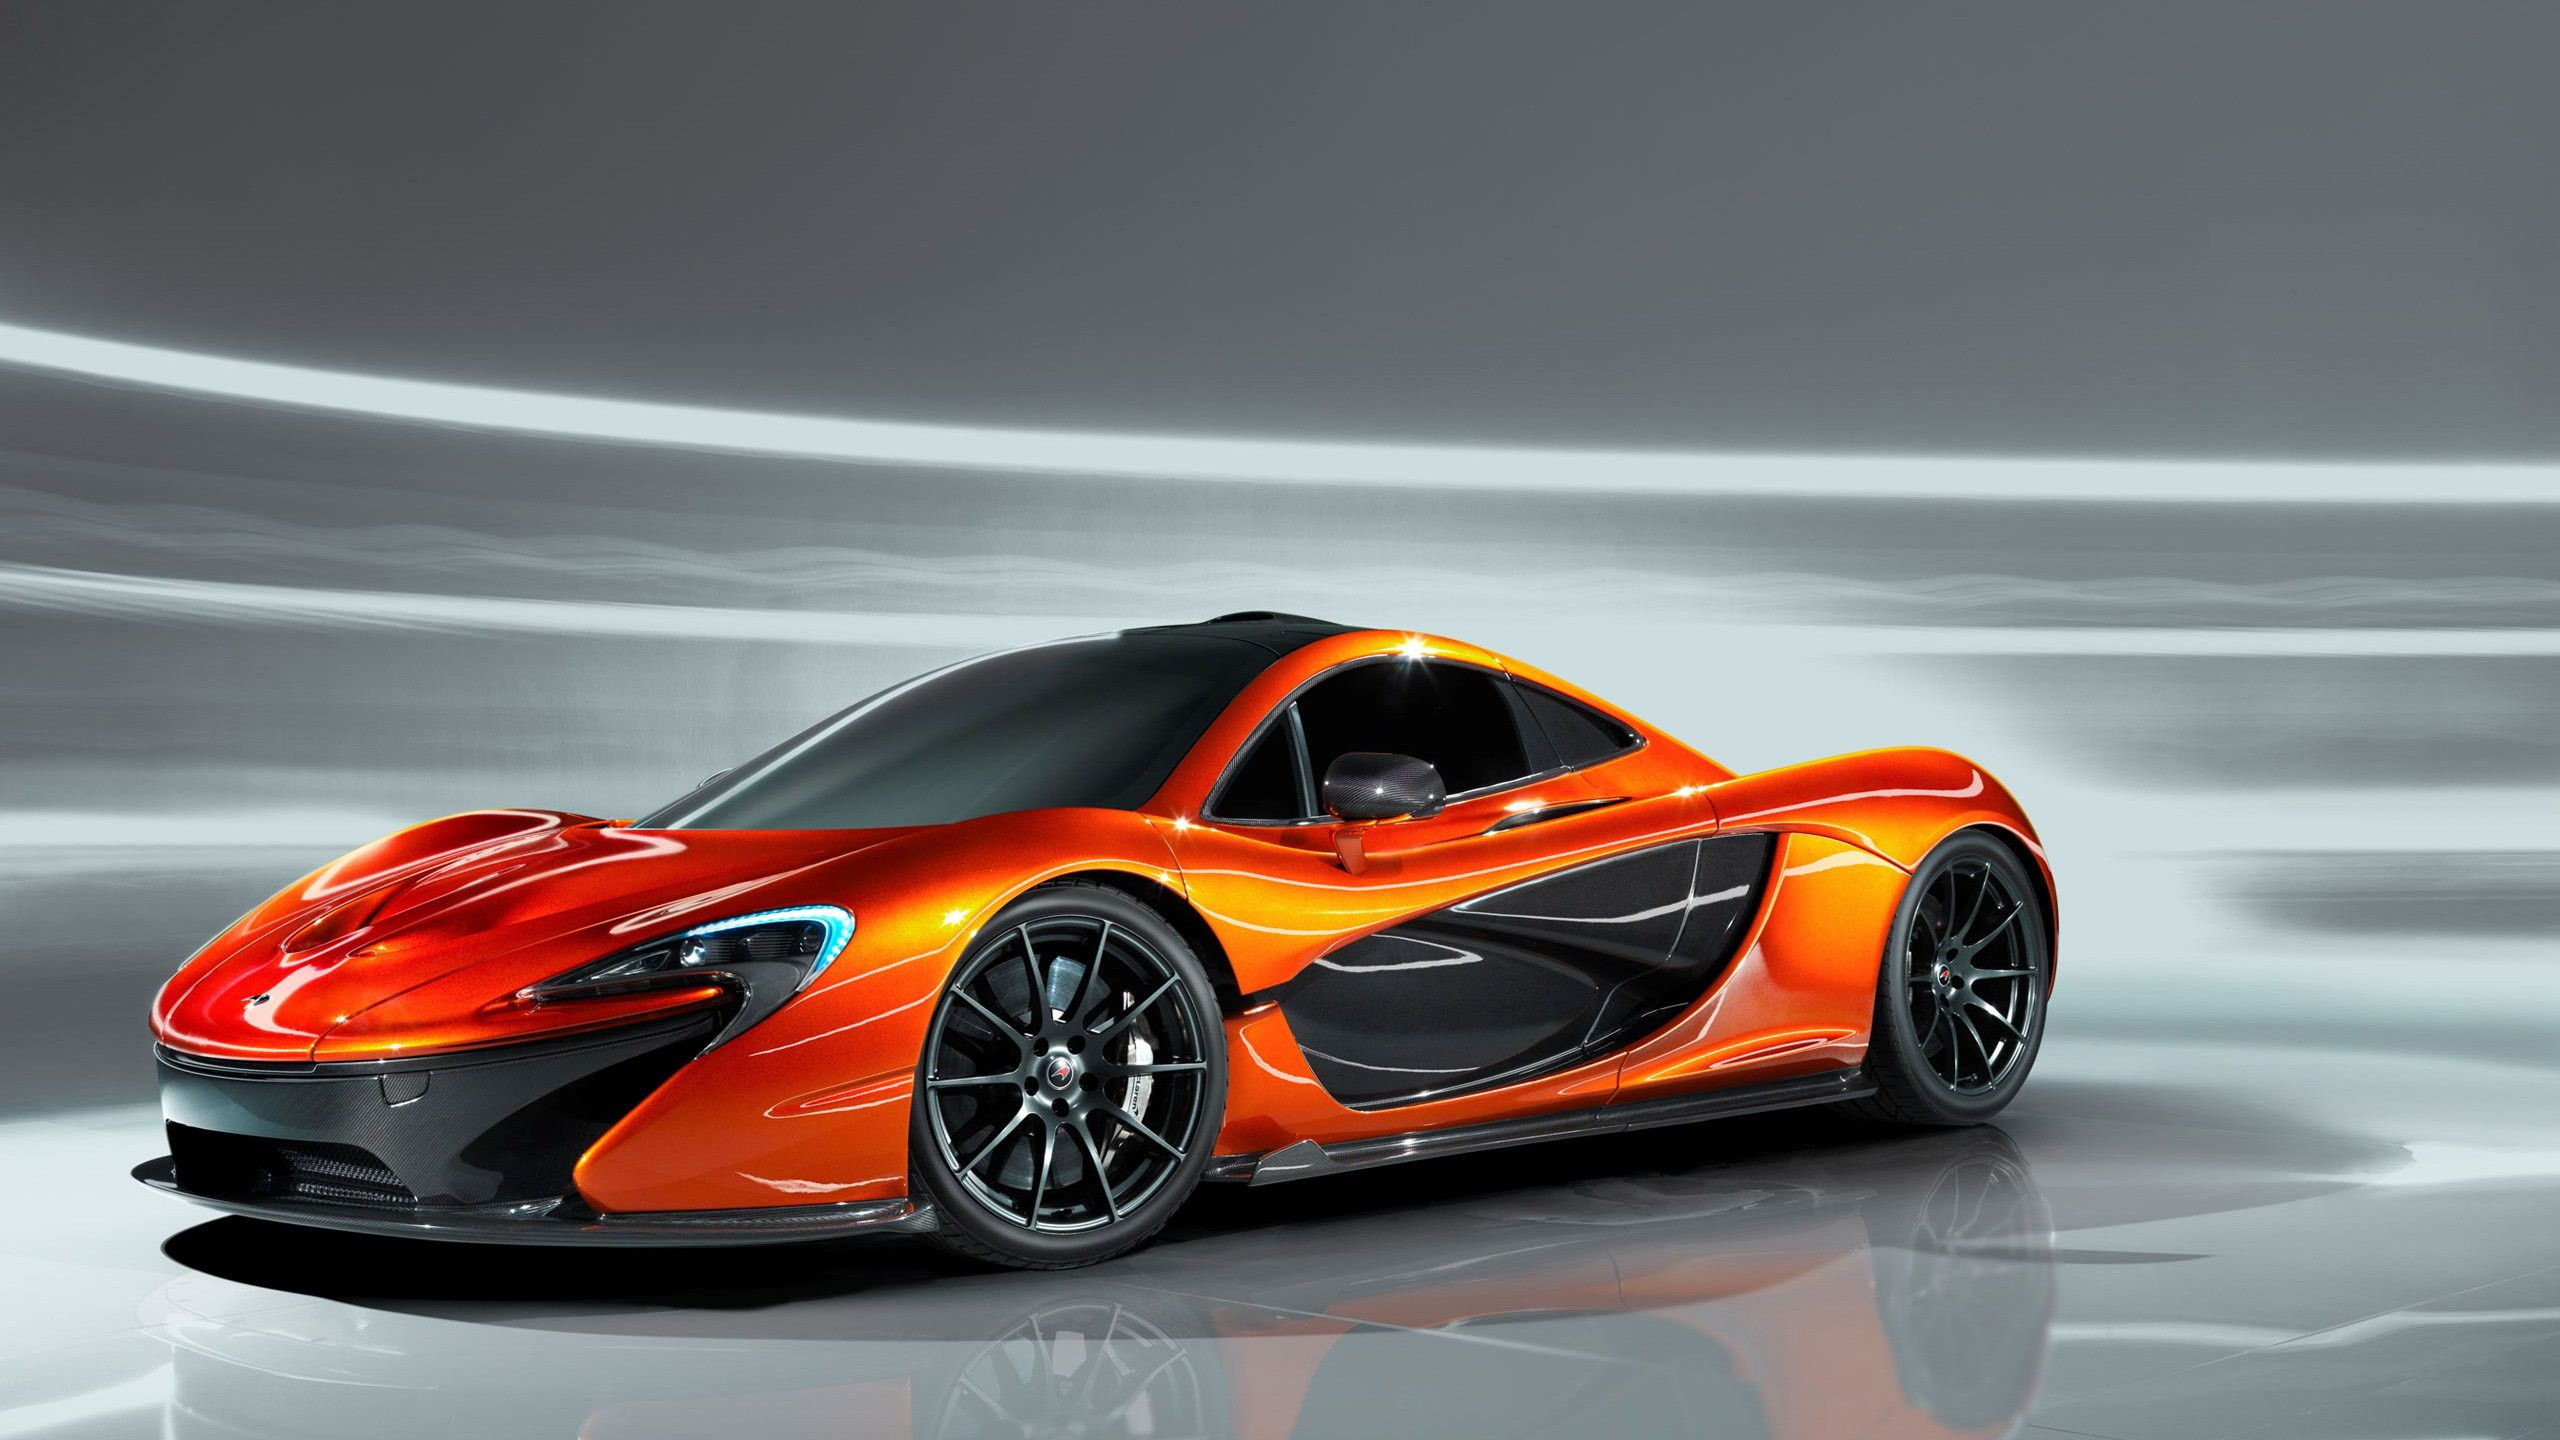 Top Ten Sports Cars 2014 Wallpaper In 2020 Cool Sports Cars Sports Car Wallpaper Super Sport Cars